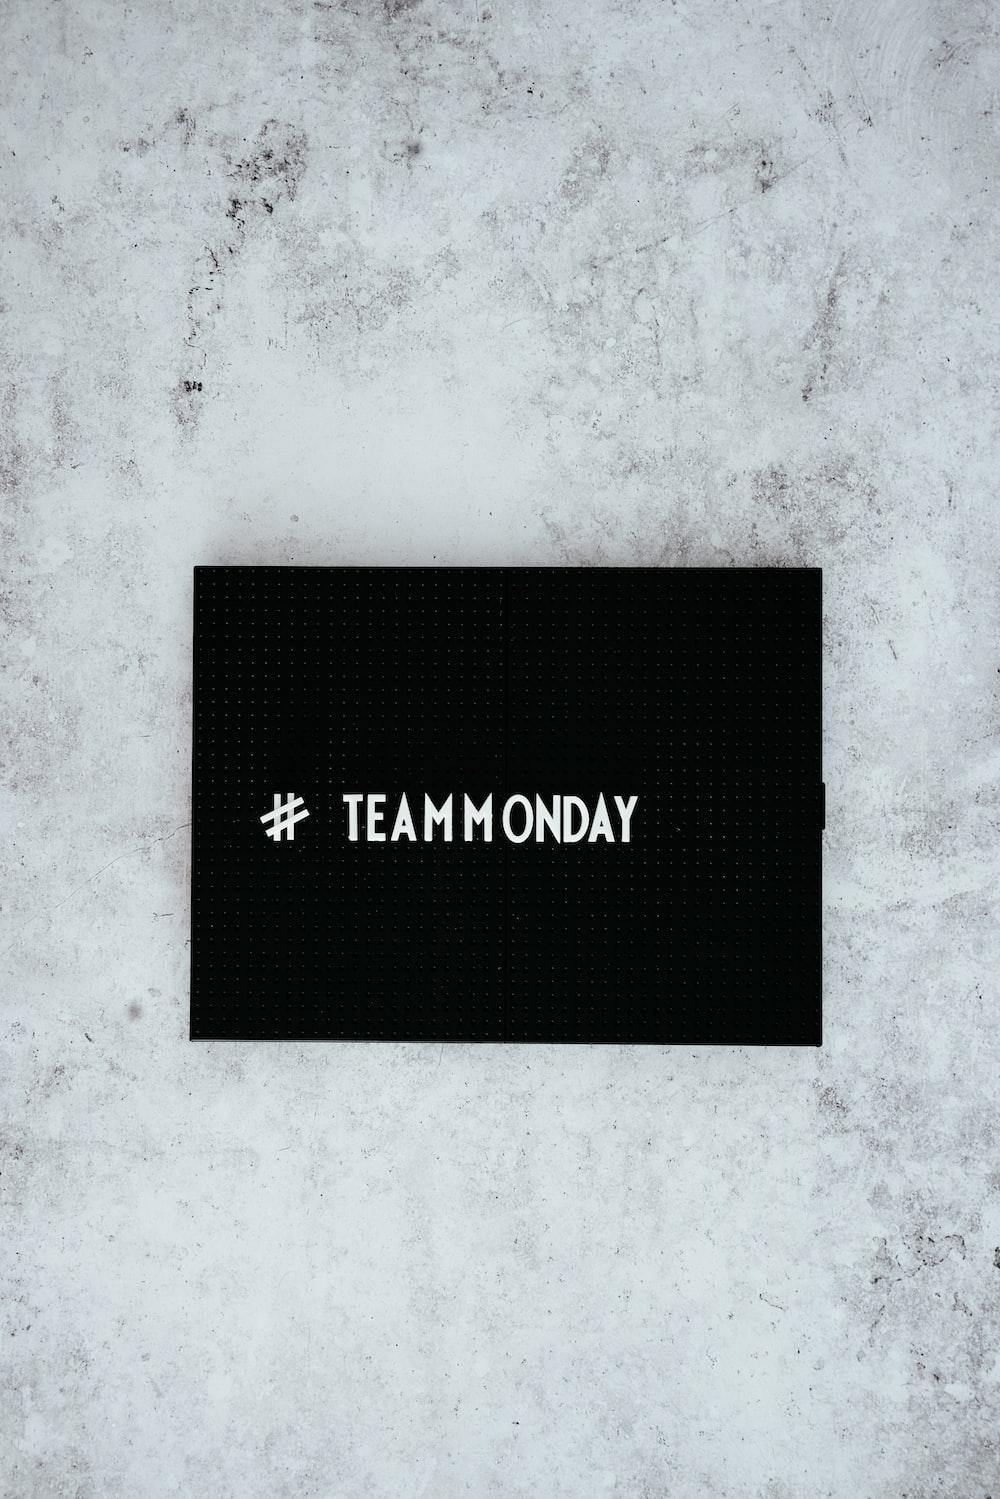 #team monday text overlay on black background